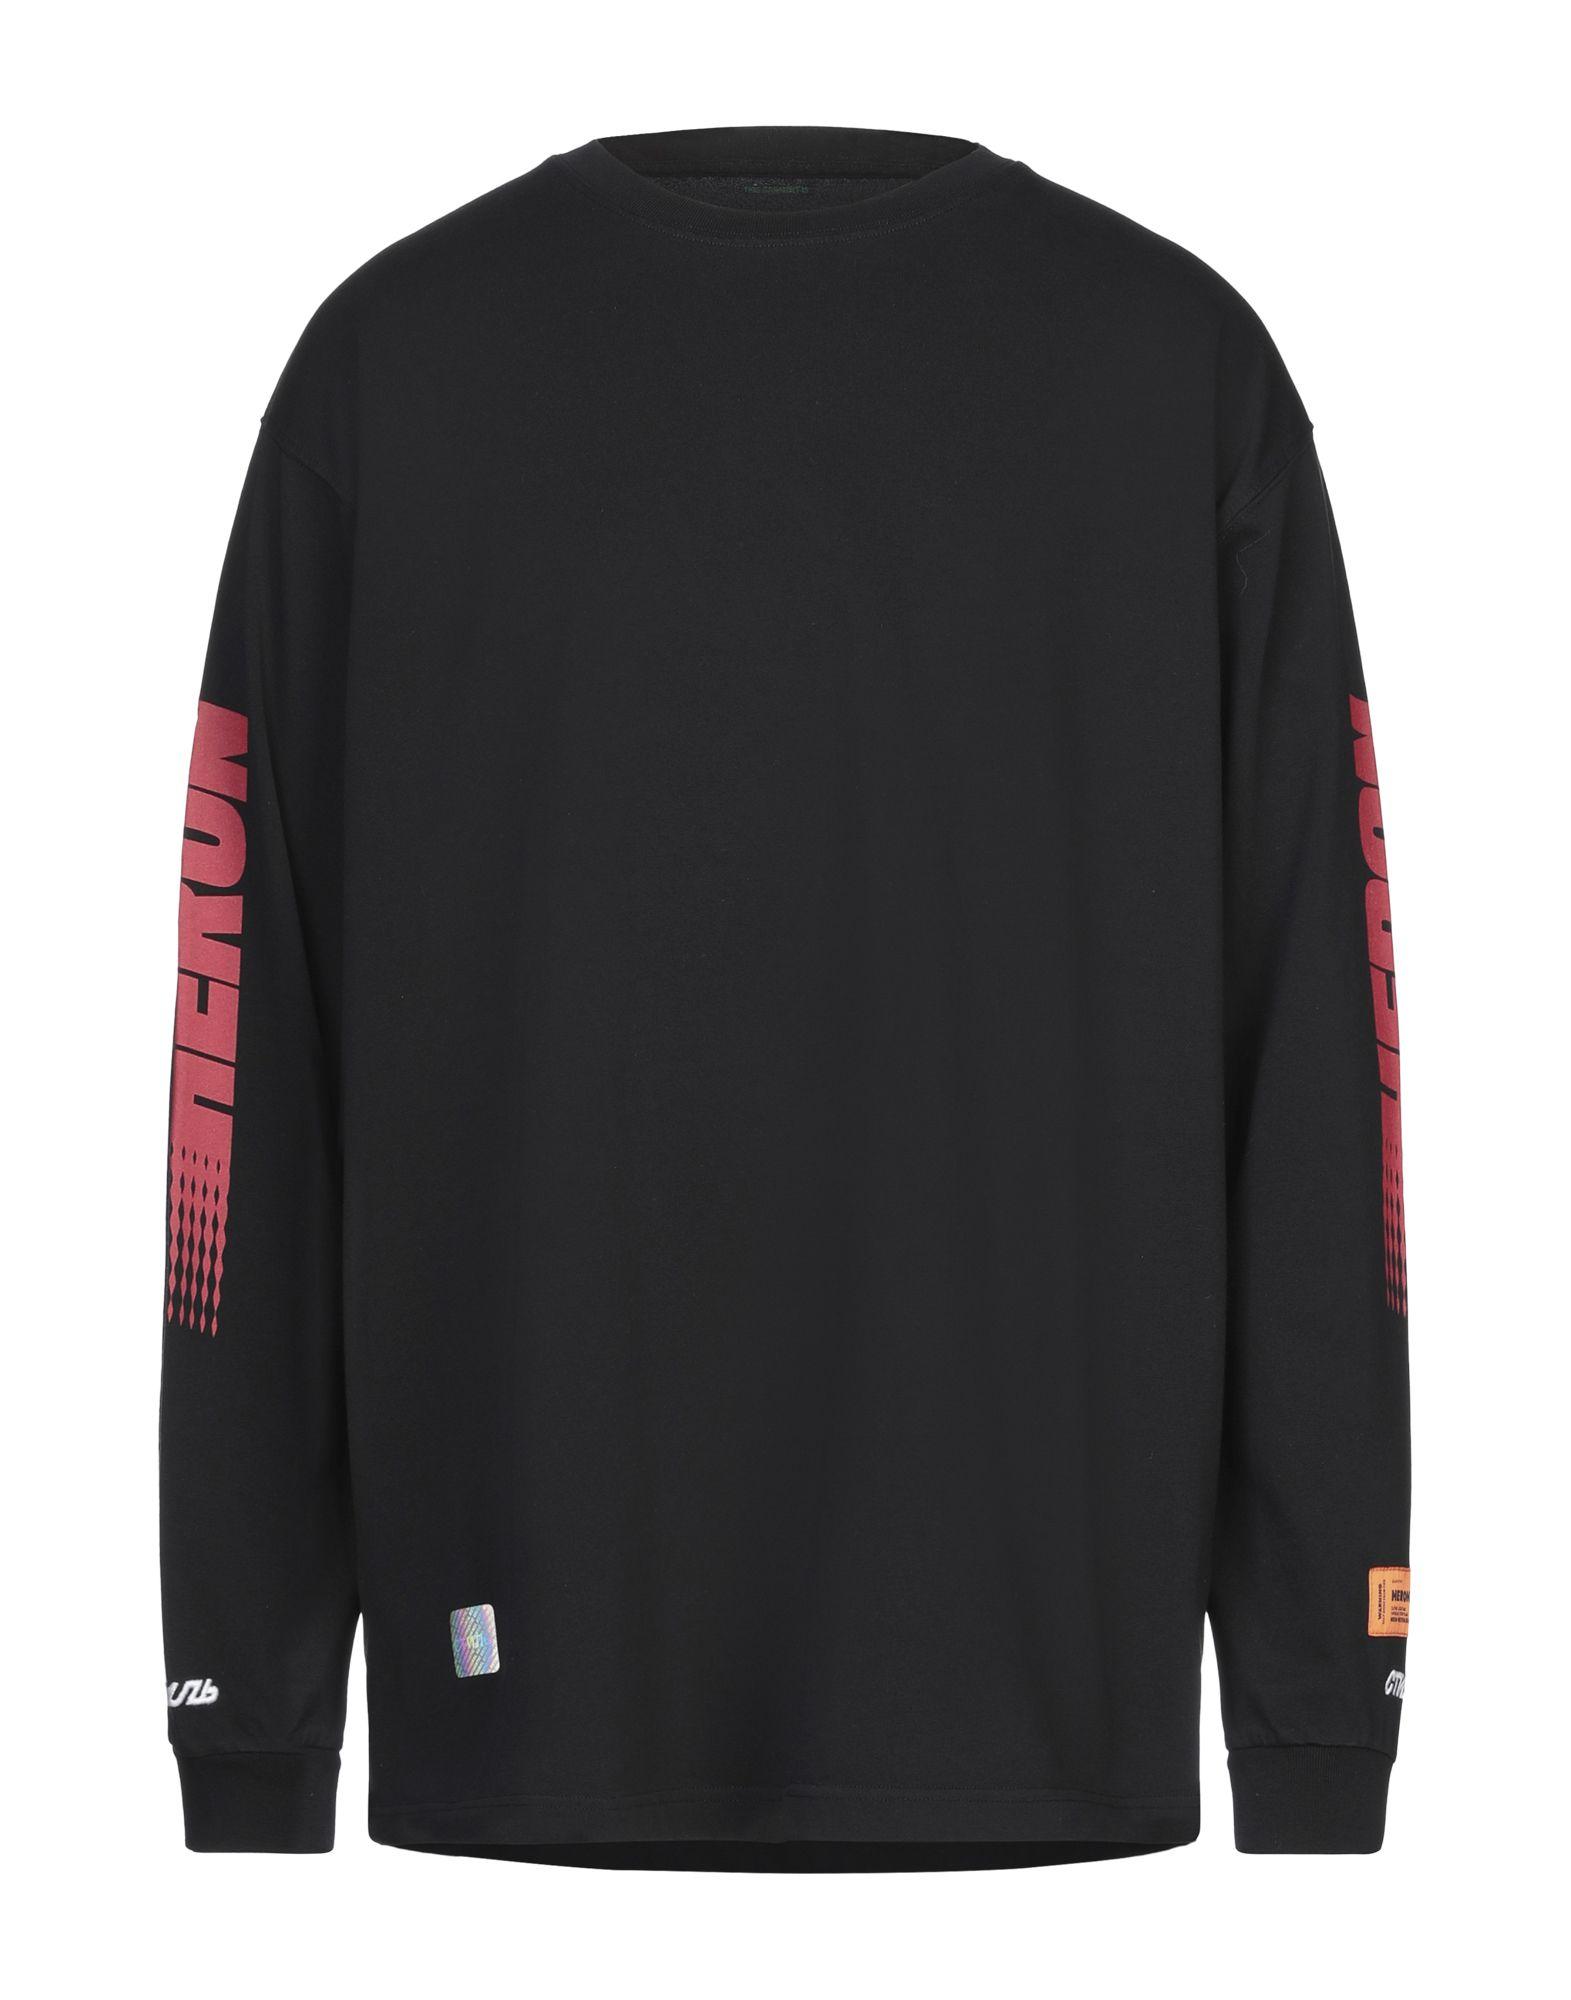 HERON PRESTON T-shirts. jersey, logo, print, solid color, round collar, long sleeves, no pockets. 100% Cotton, Polyester